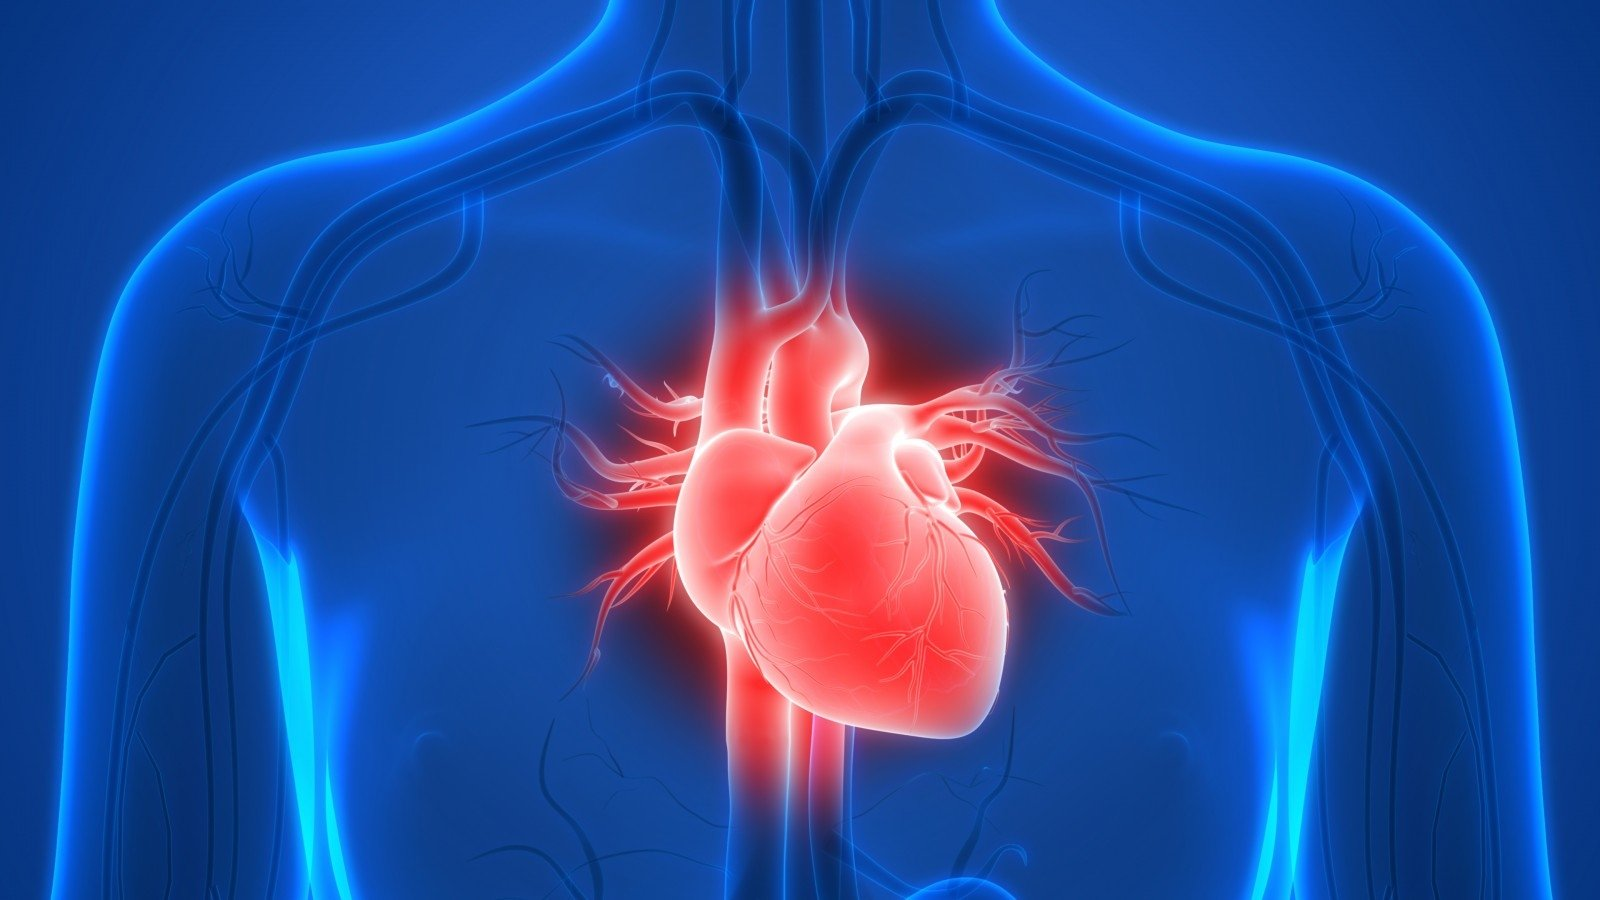 hipertenzija Karlovy Vary vaizdo hipertenzijos gydymas gimnastika kaklui